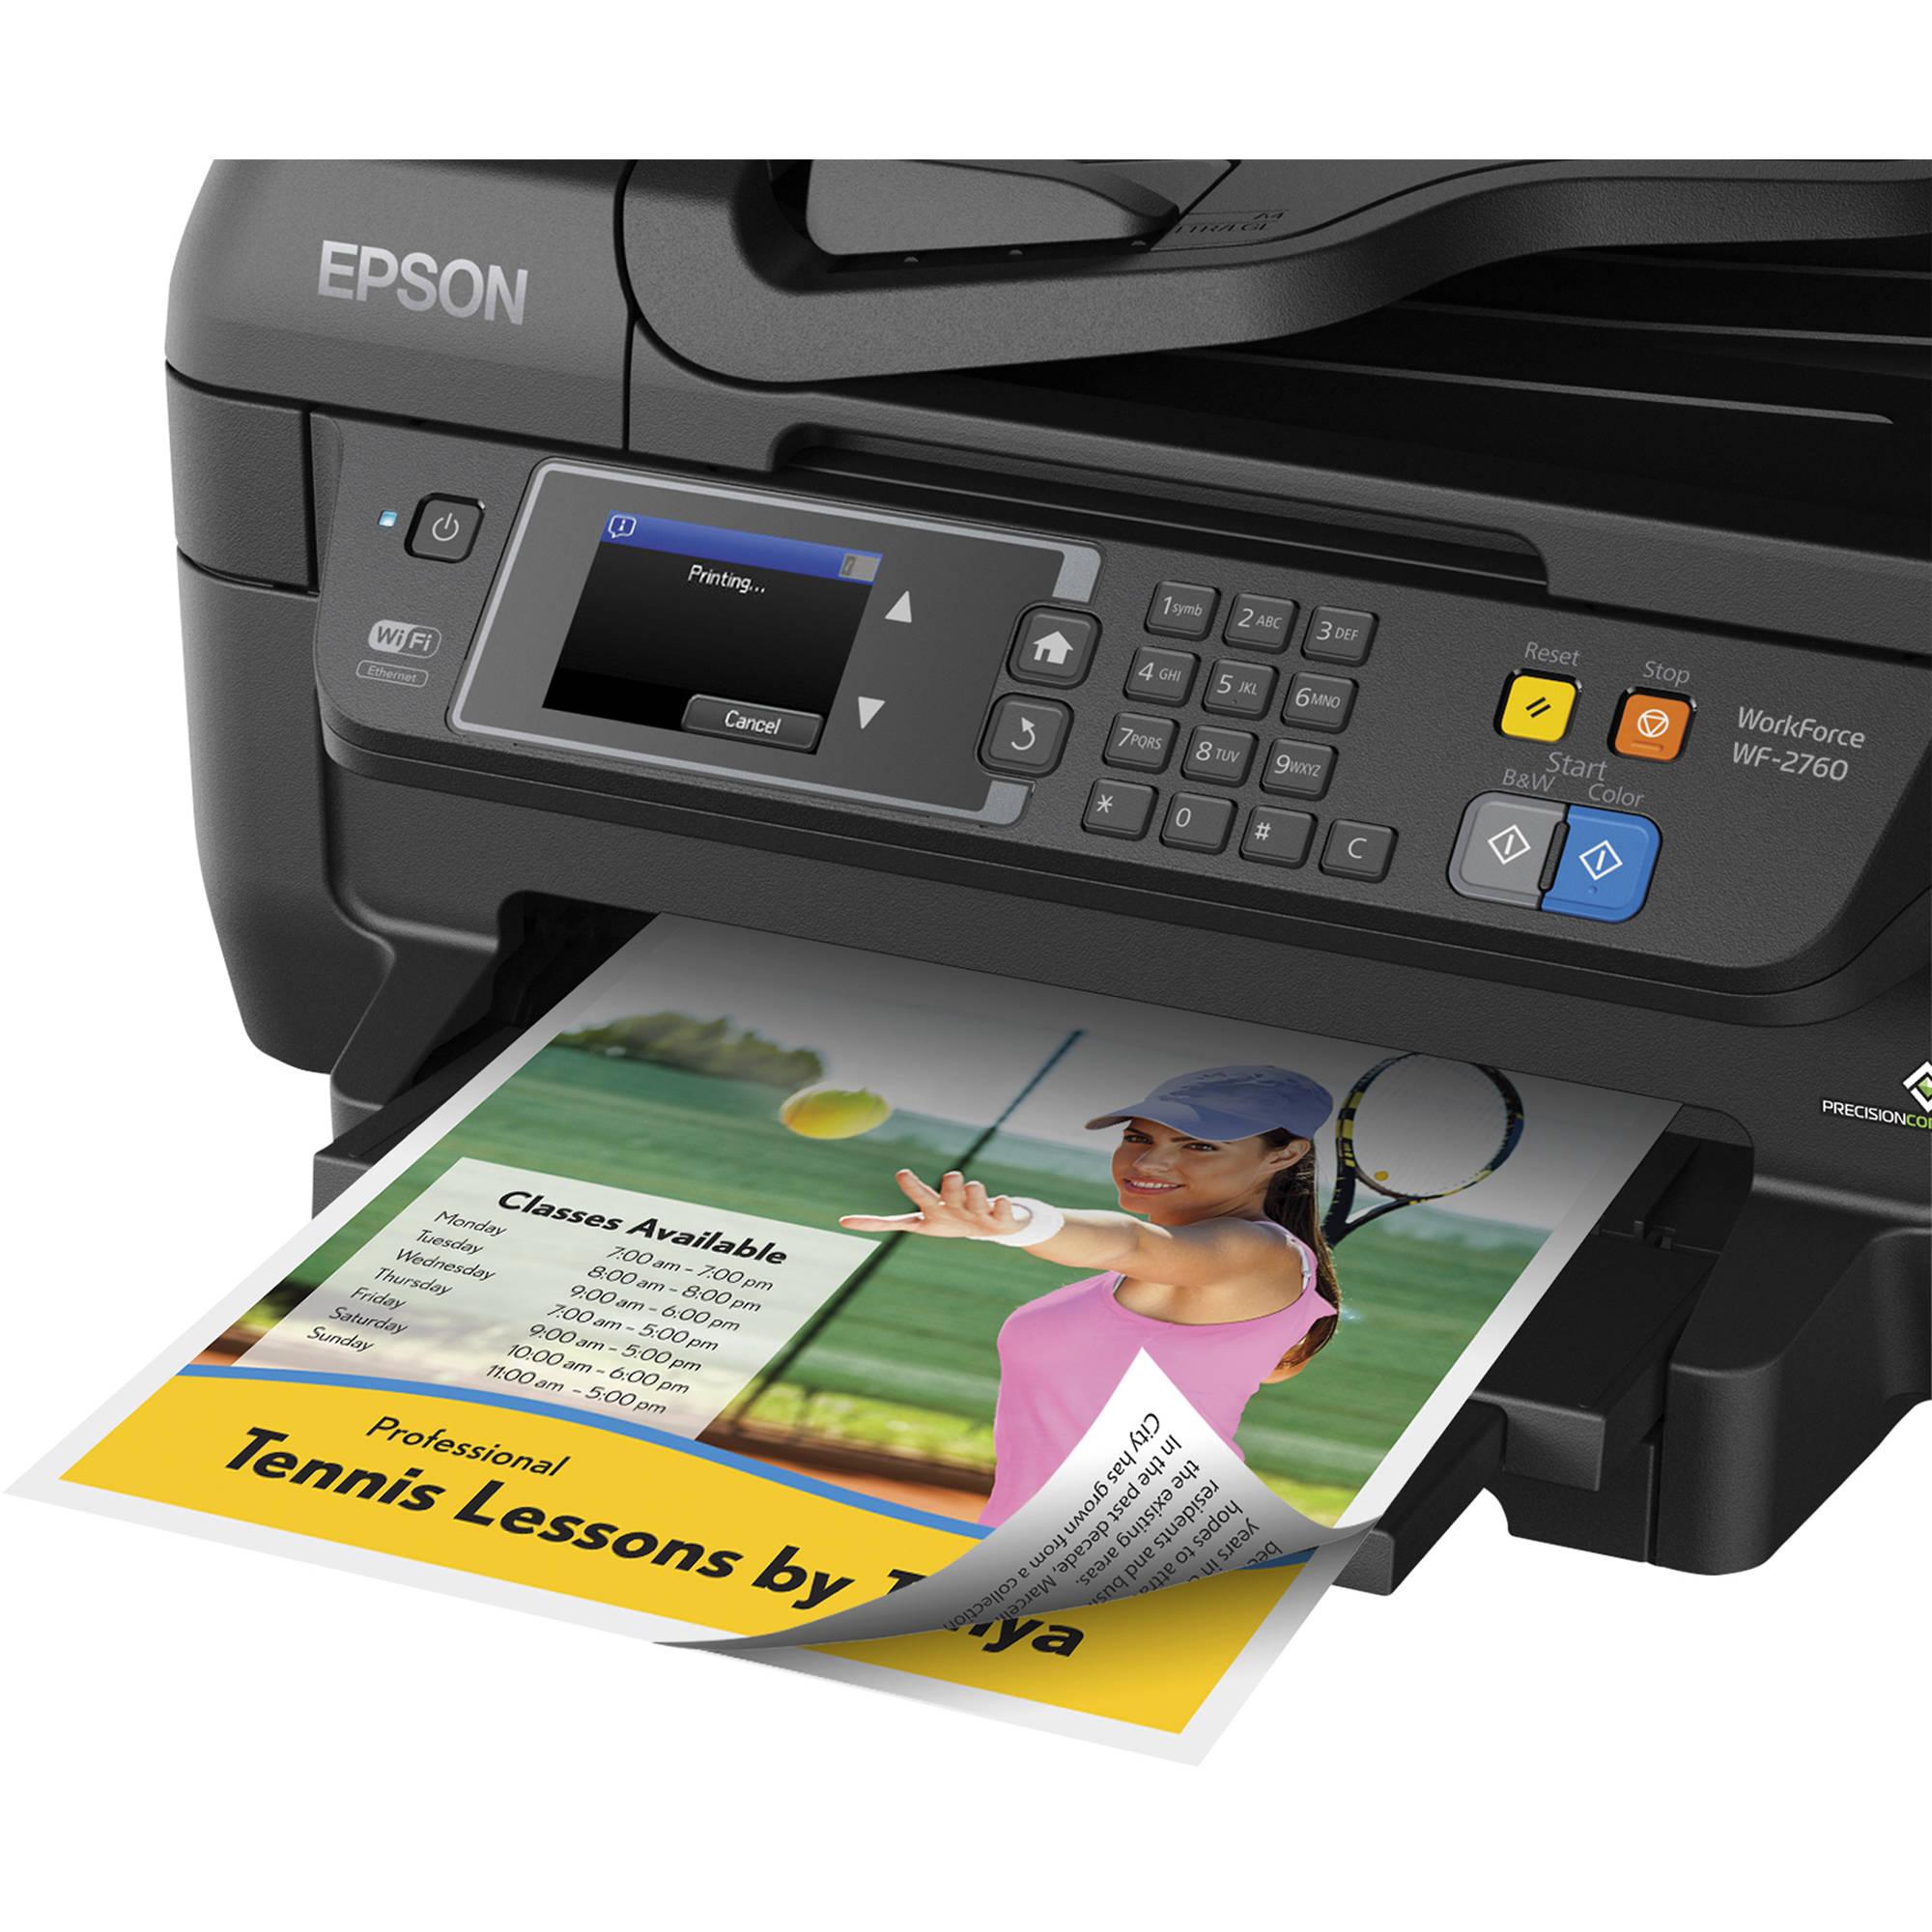 Epson WorkForce WF-2760 All-in-One Inkjet Printer